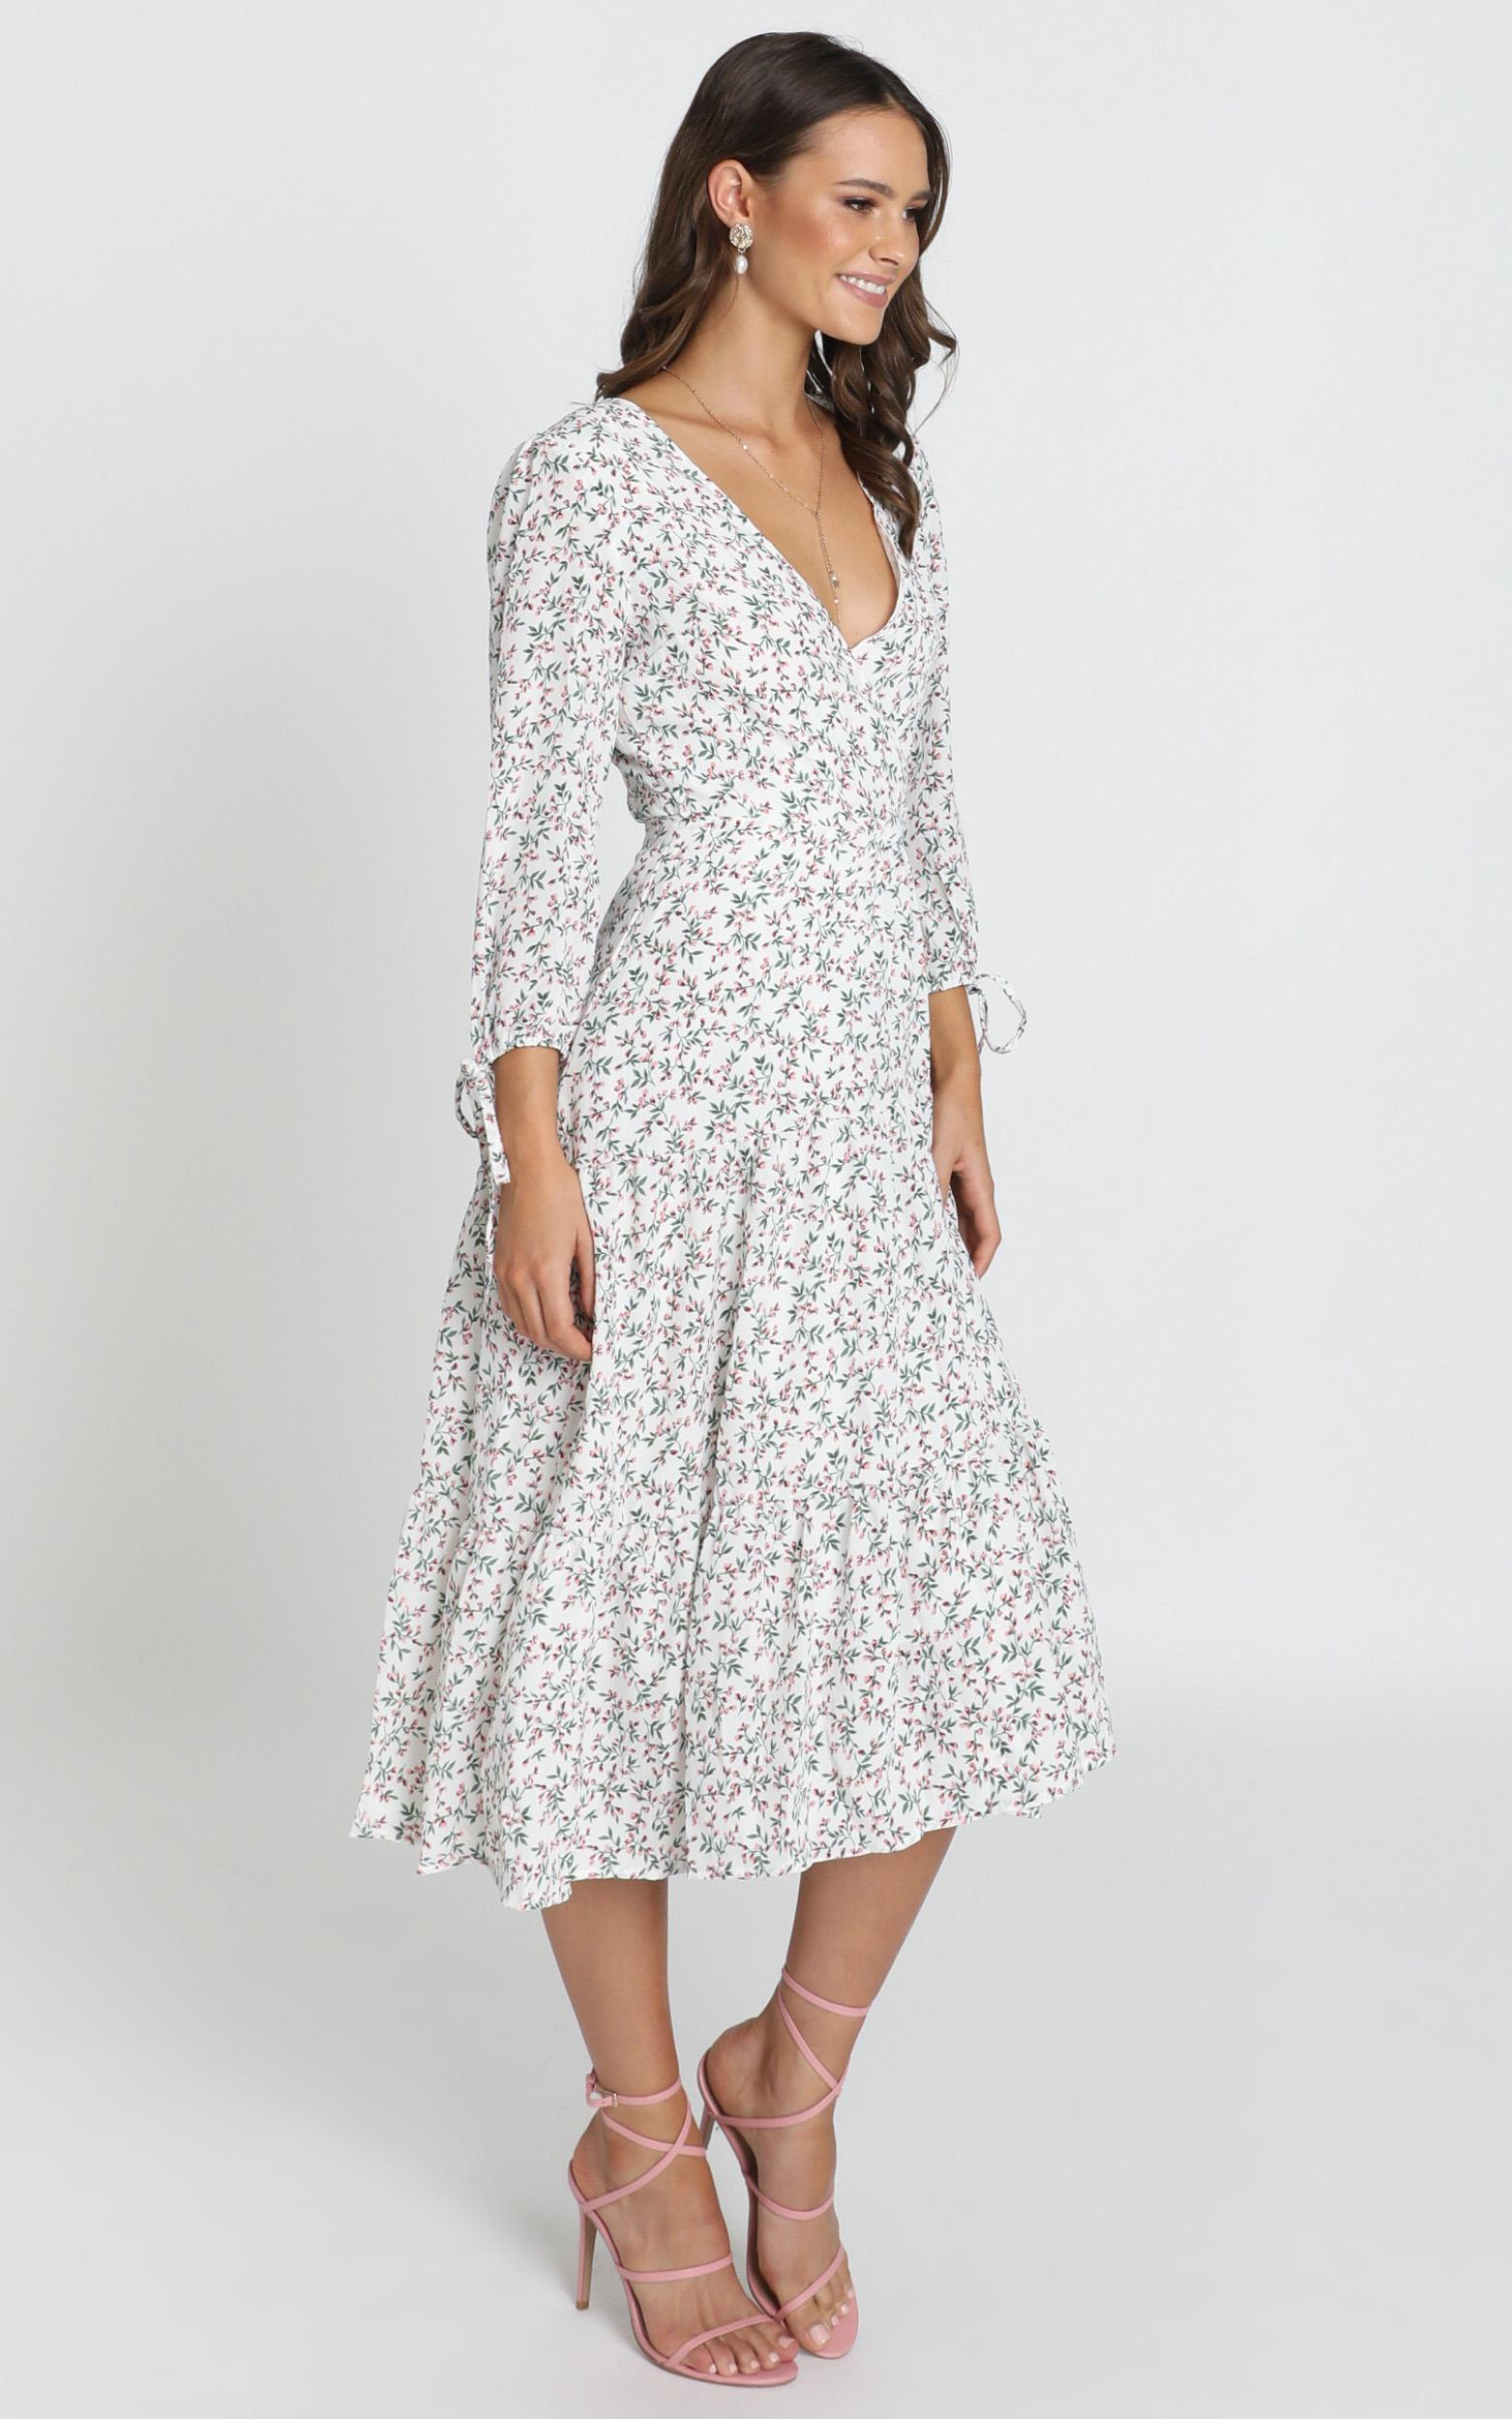 Pelia V-Neck Midi Dress in white floral - 12 (L), White, hi-res image number null